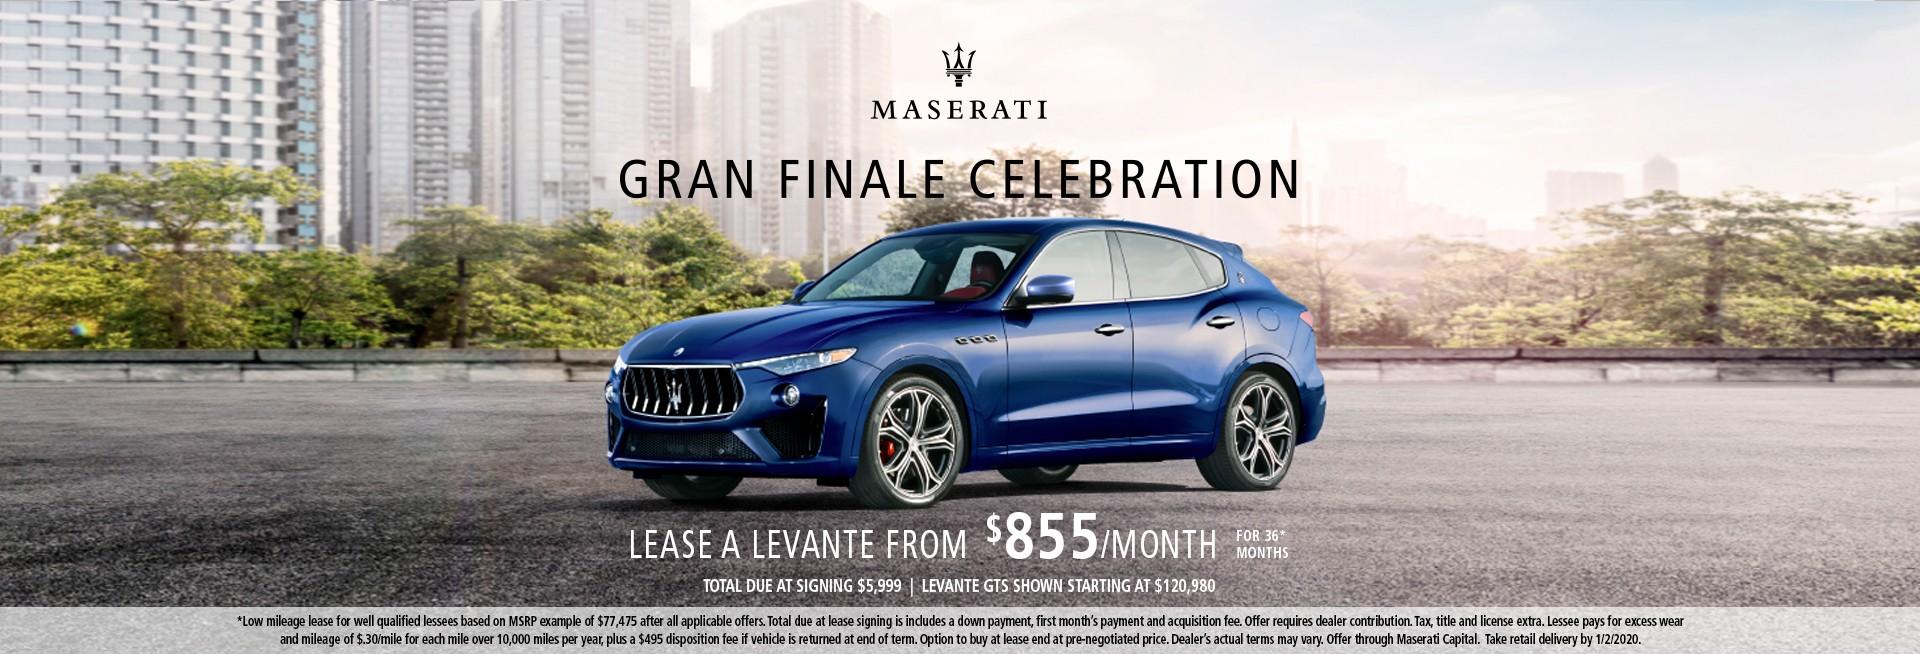 Gran Finale Celebration Levante GTS Starting at $120,980